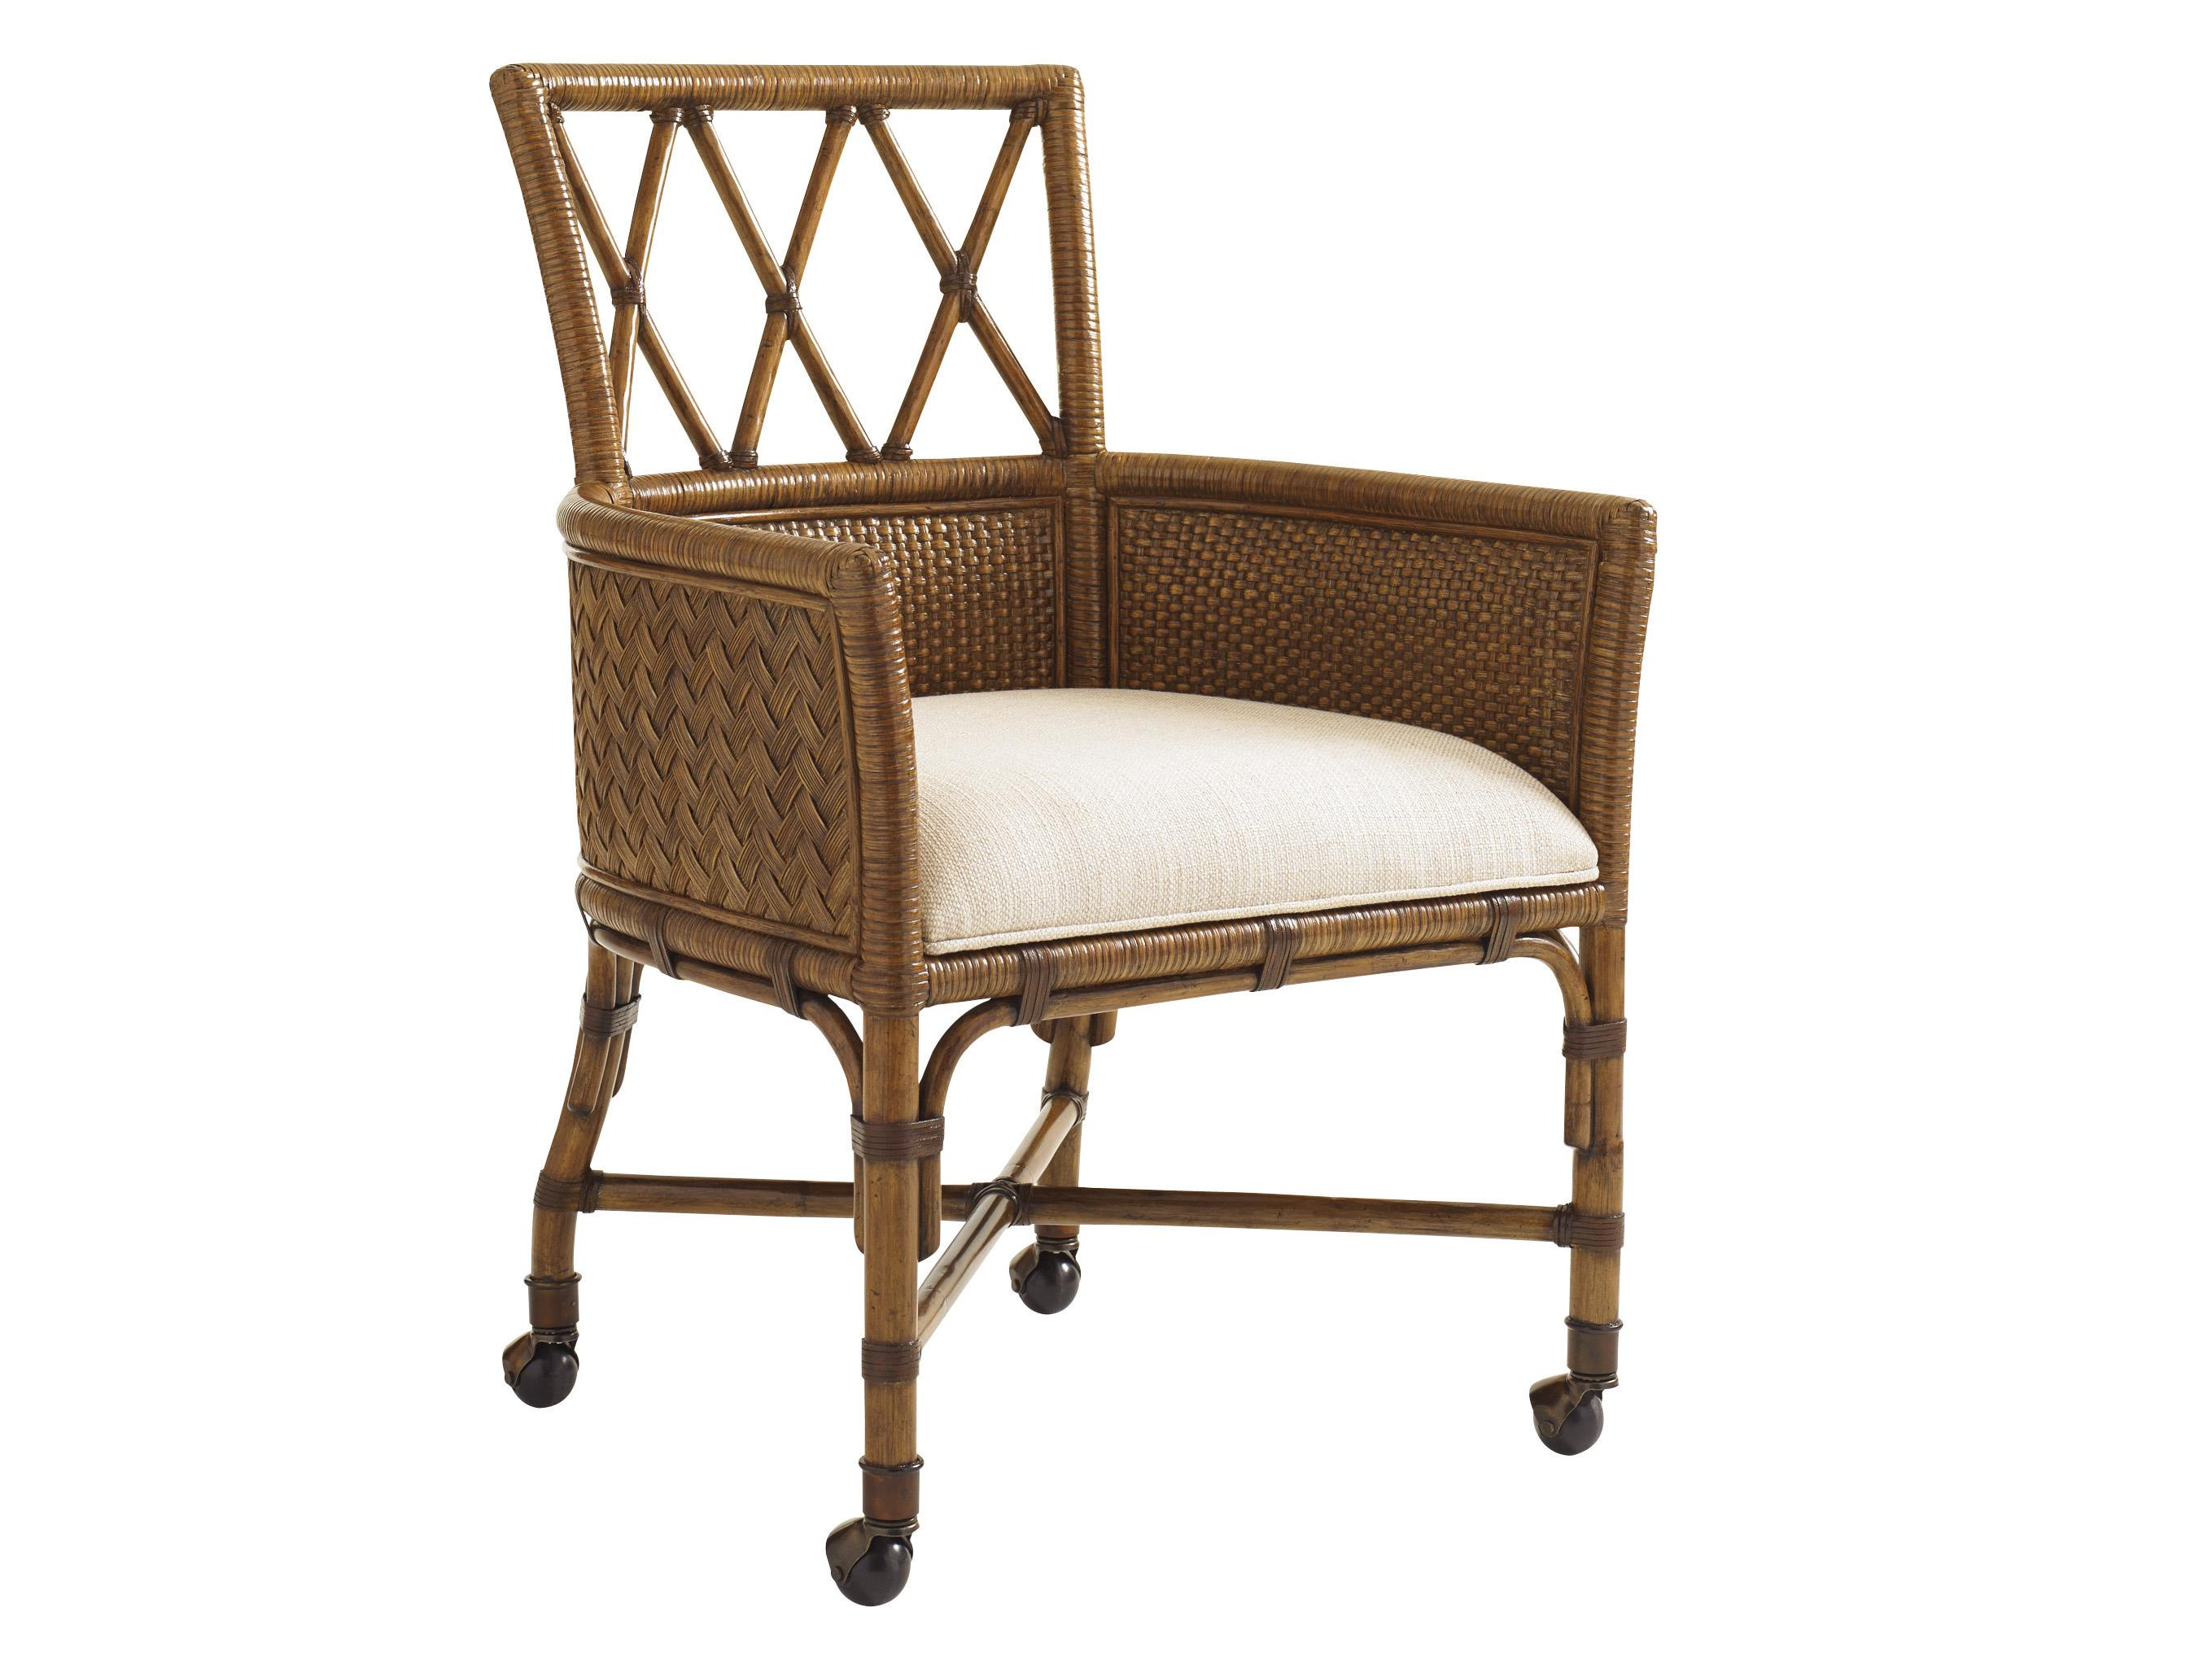 Tommy Bahama Home Bali Hai Quickship Tarpon Cove Game Chair - Item Number: 593-972-01